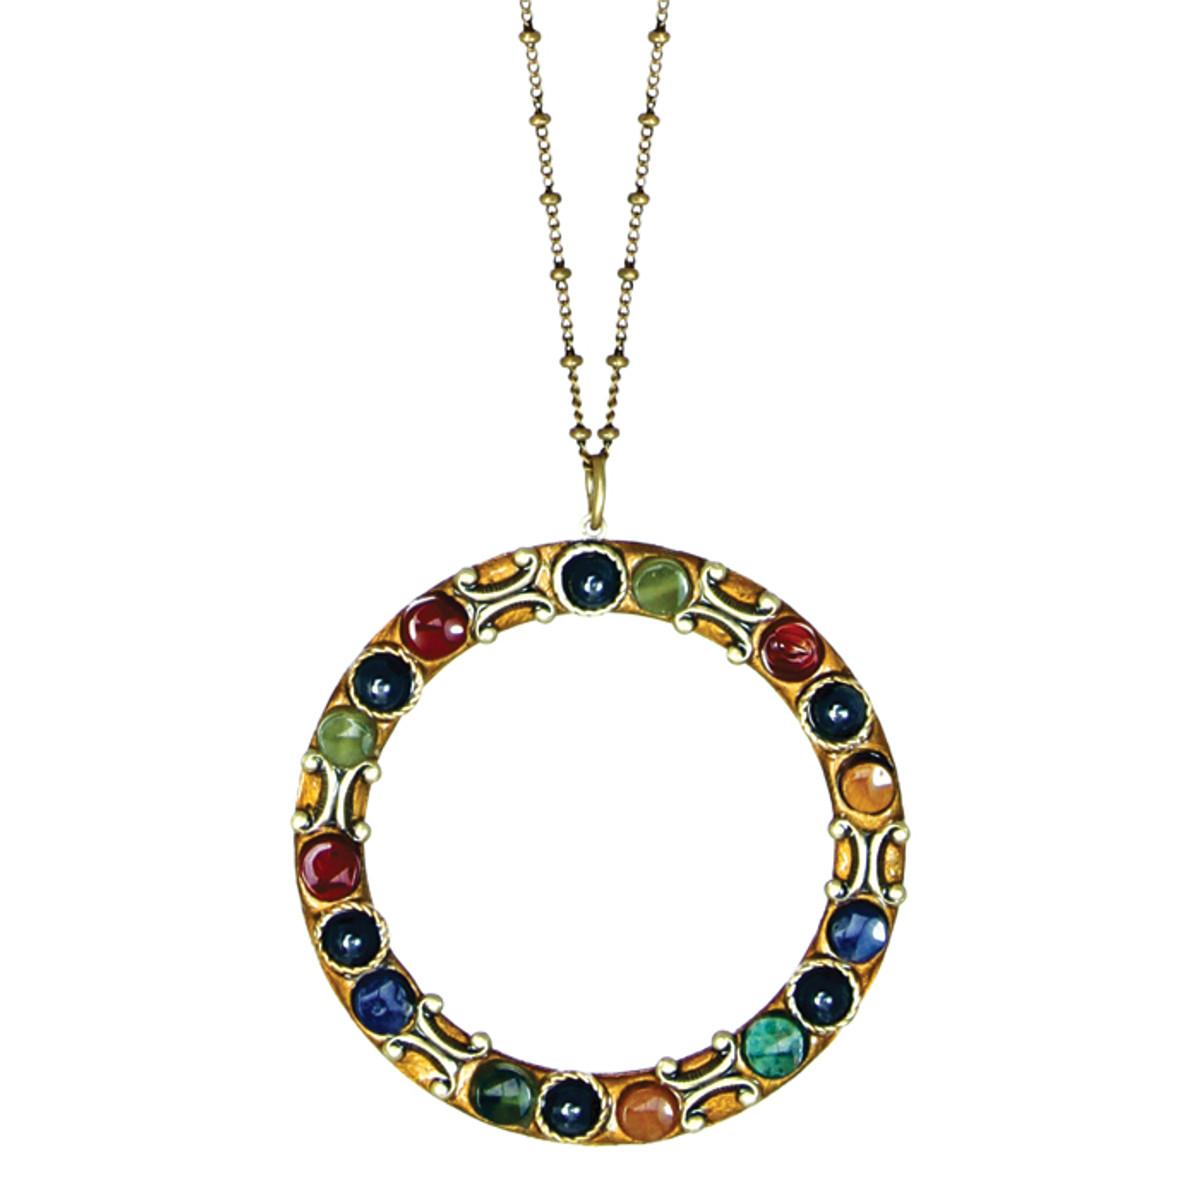 Michal Golan Jewelry Necklace - Durango Hoop Chain